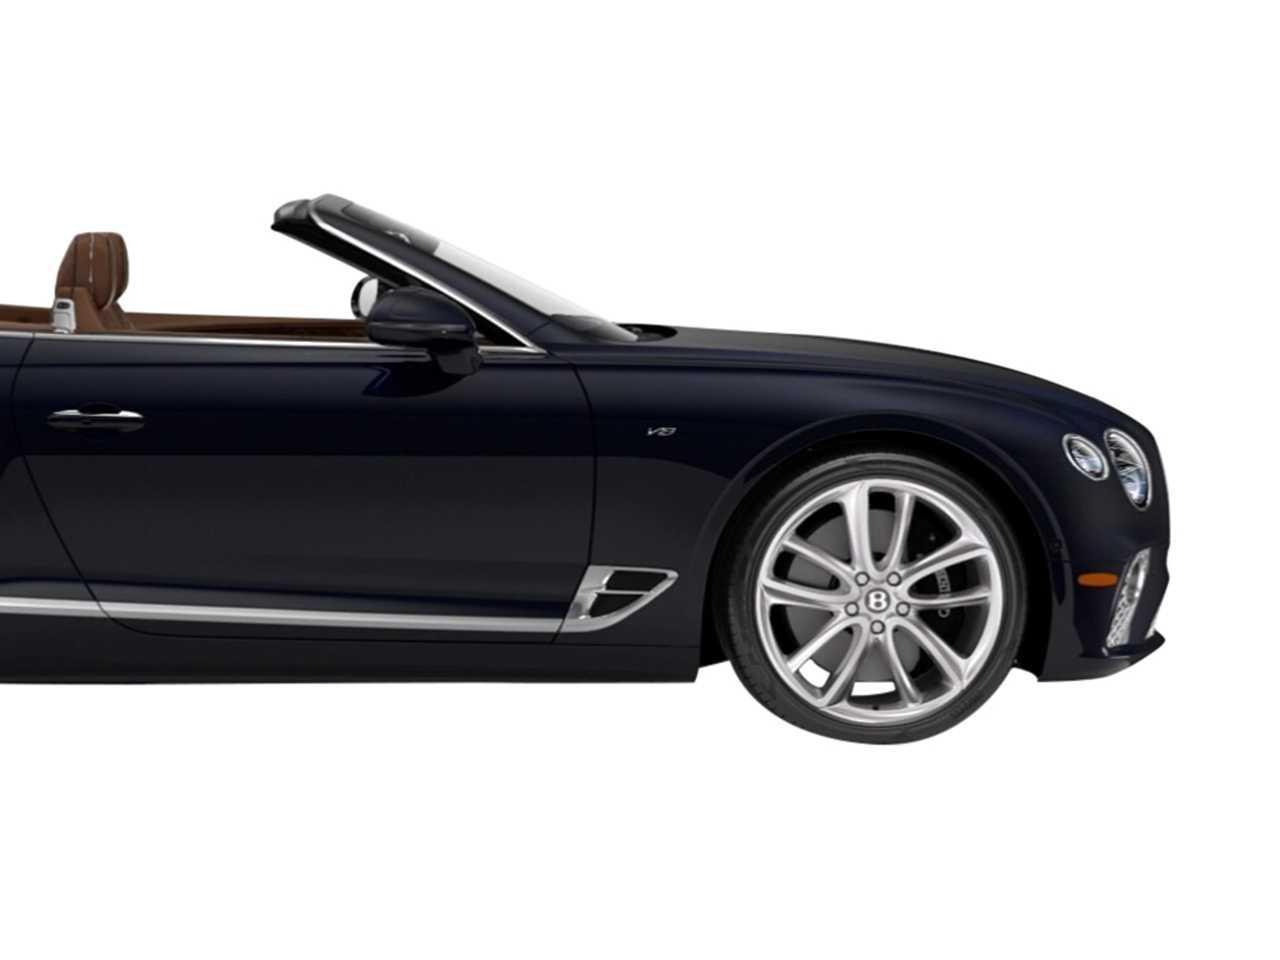 Bentley GTC Cab